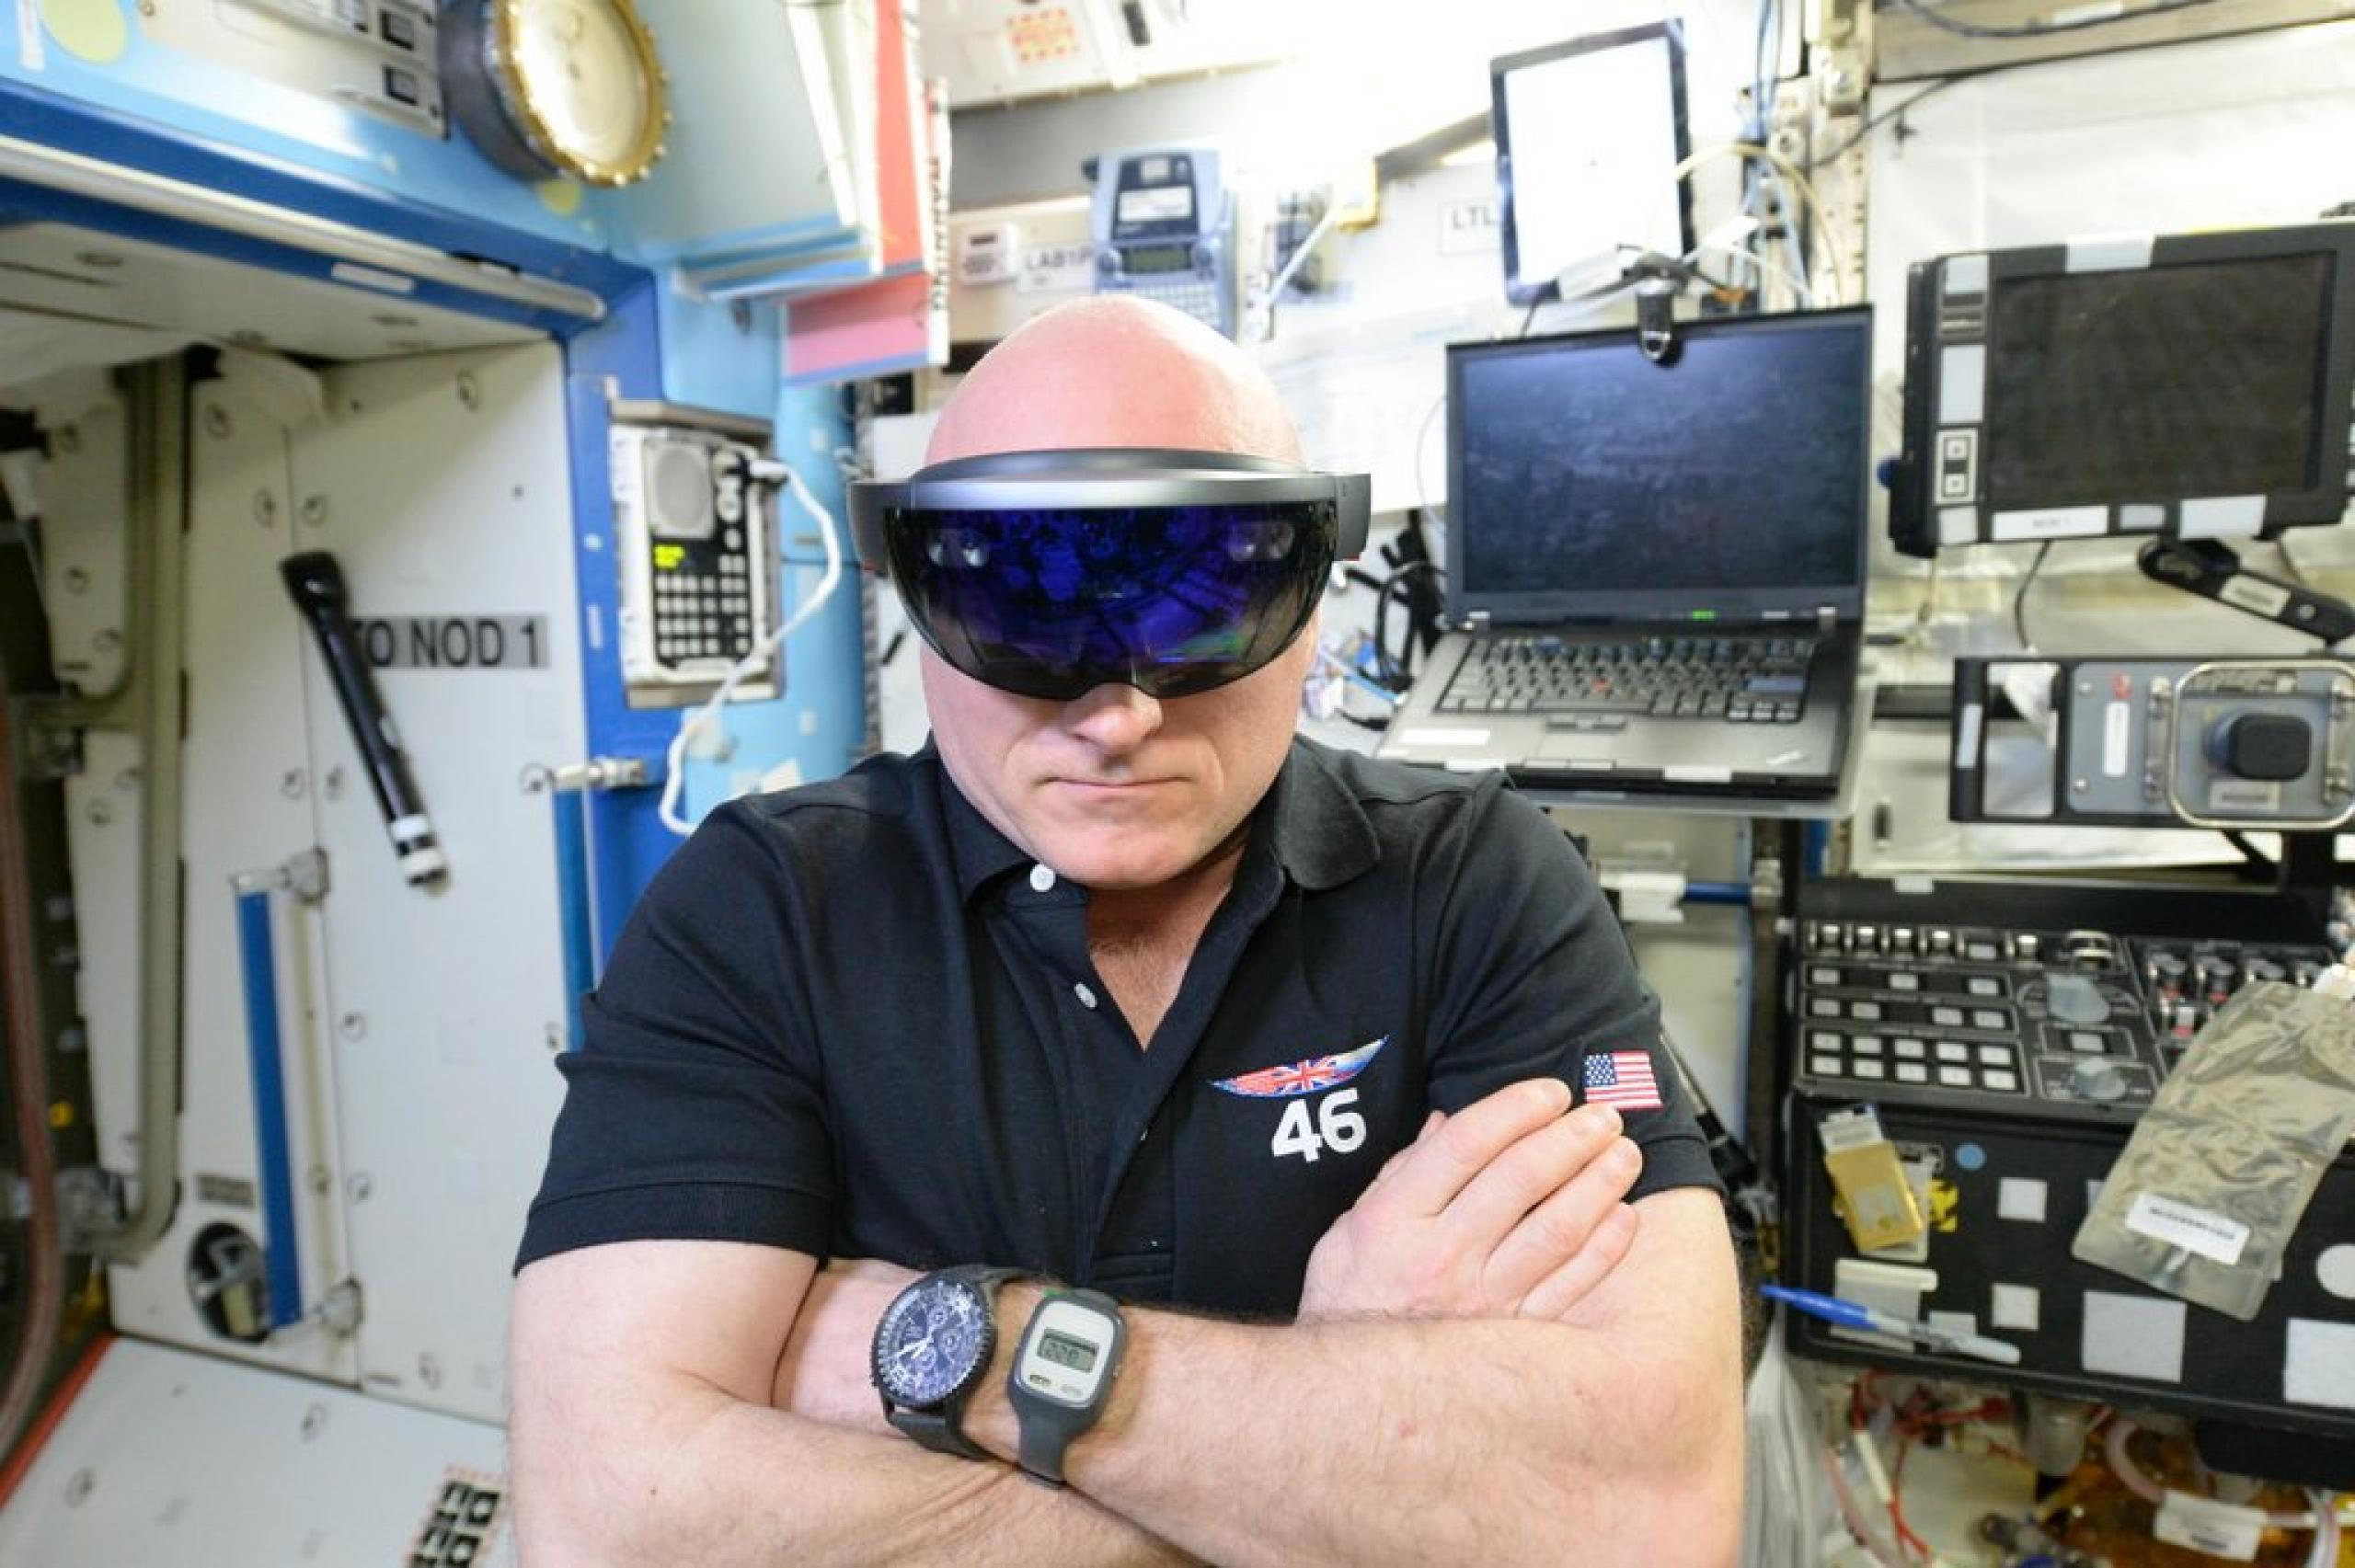 imagen de un astronauta usanda gafas de VR